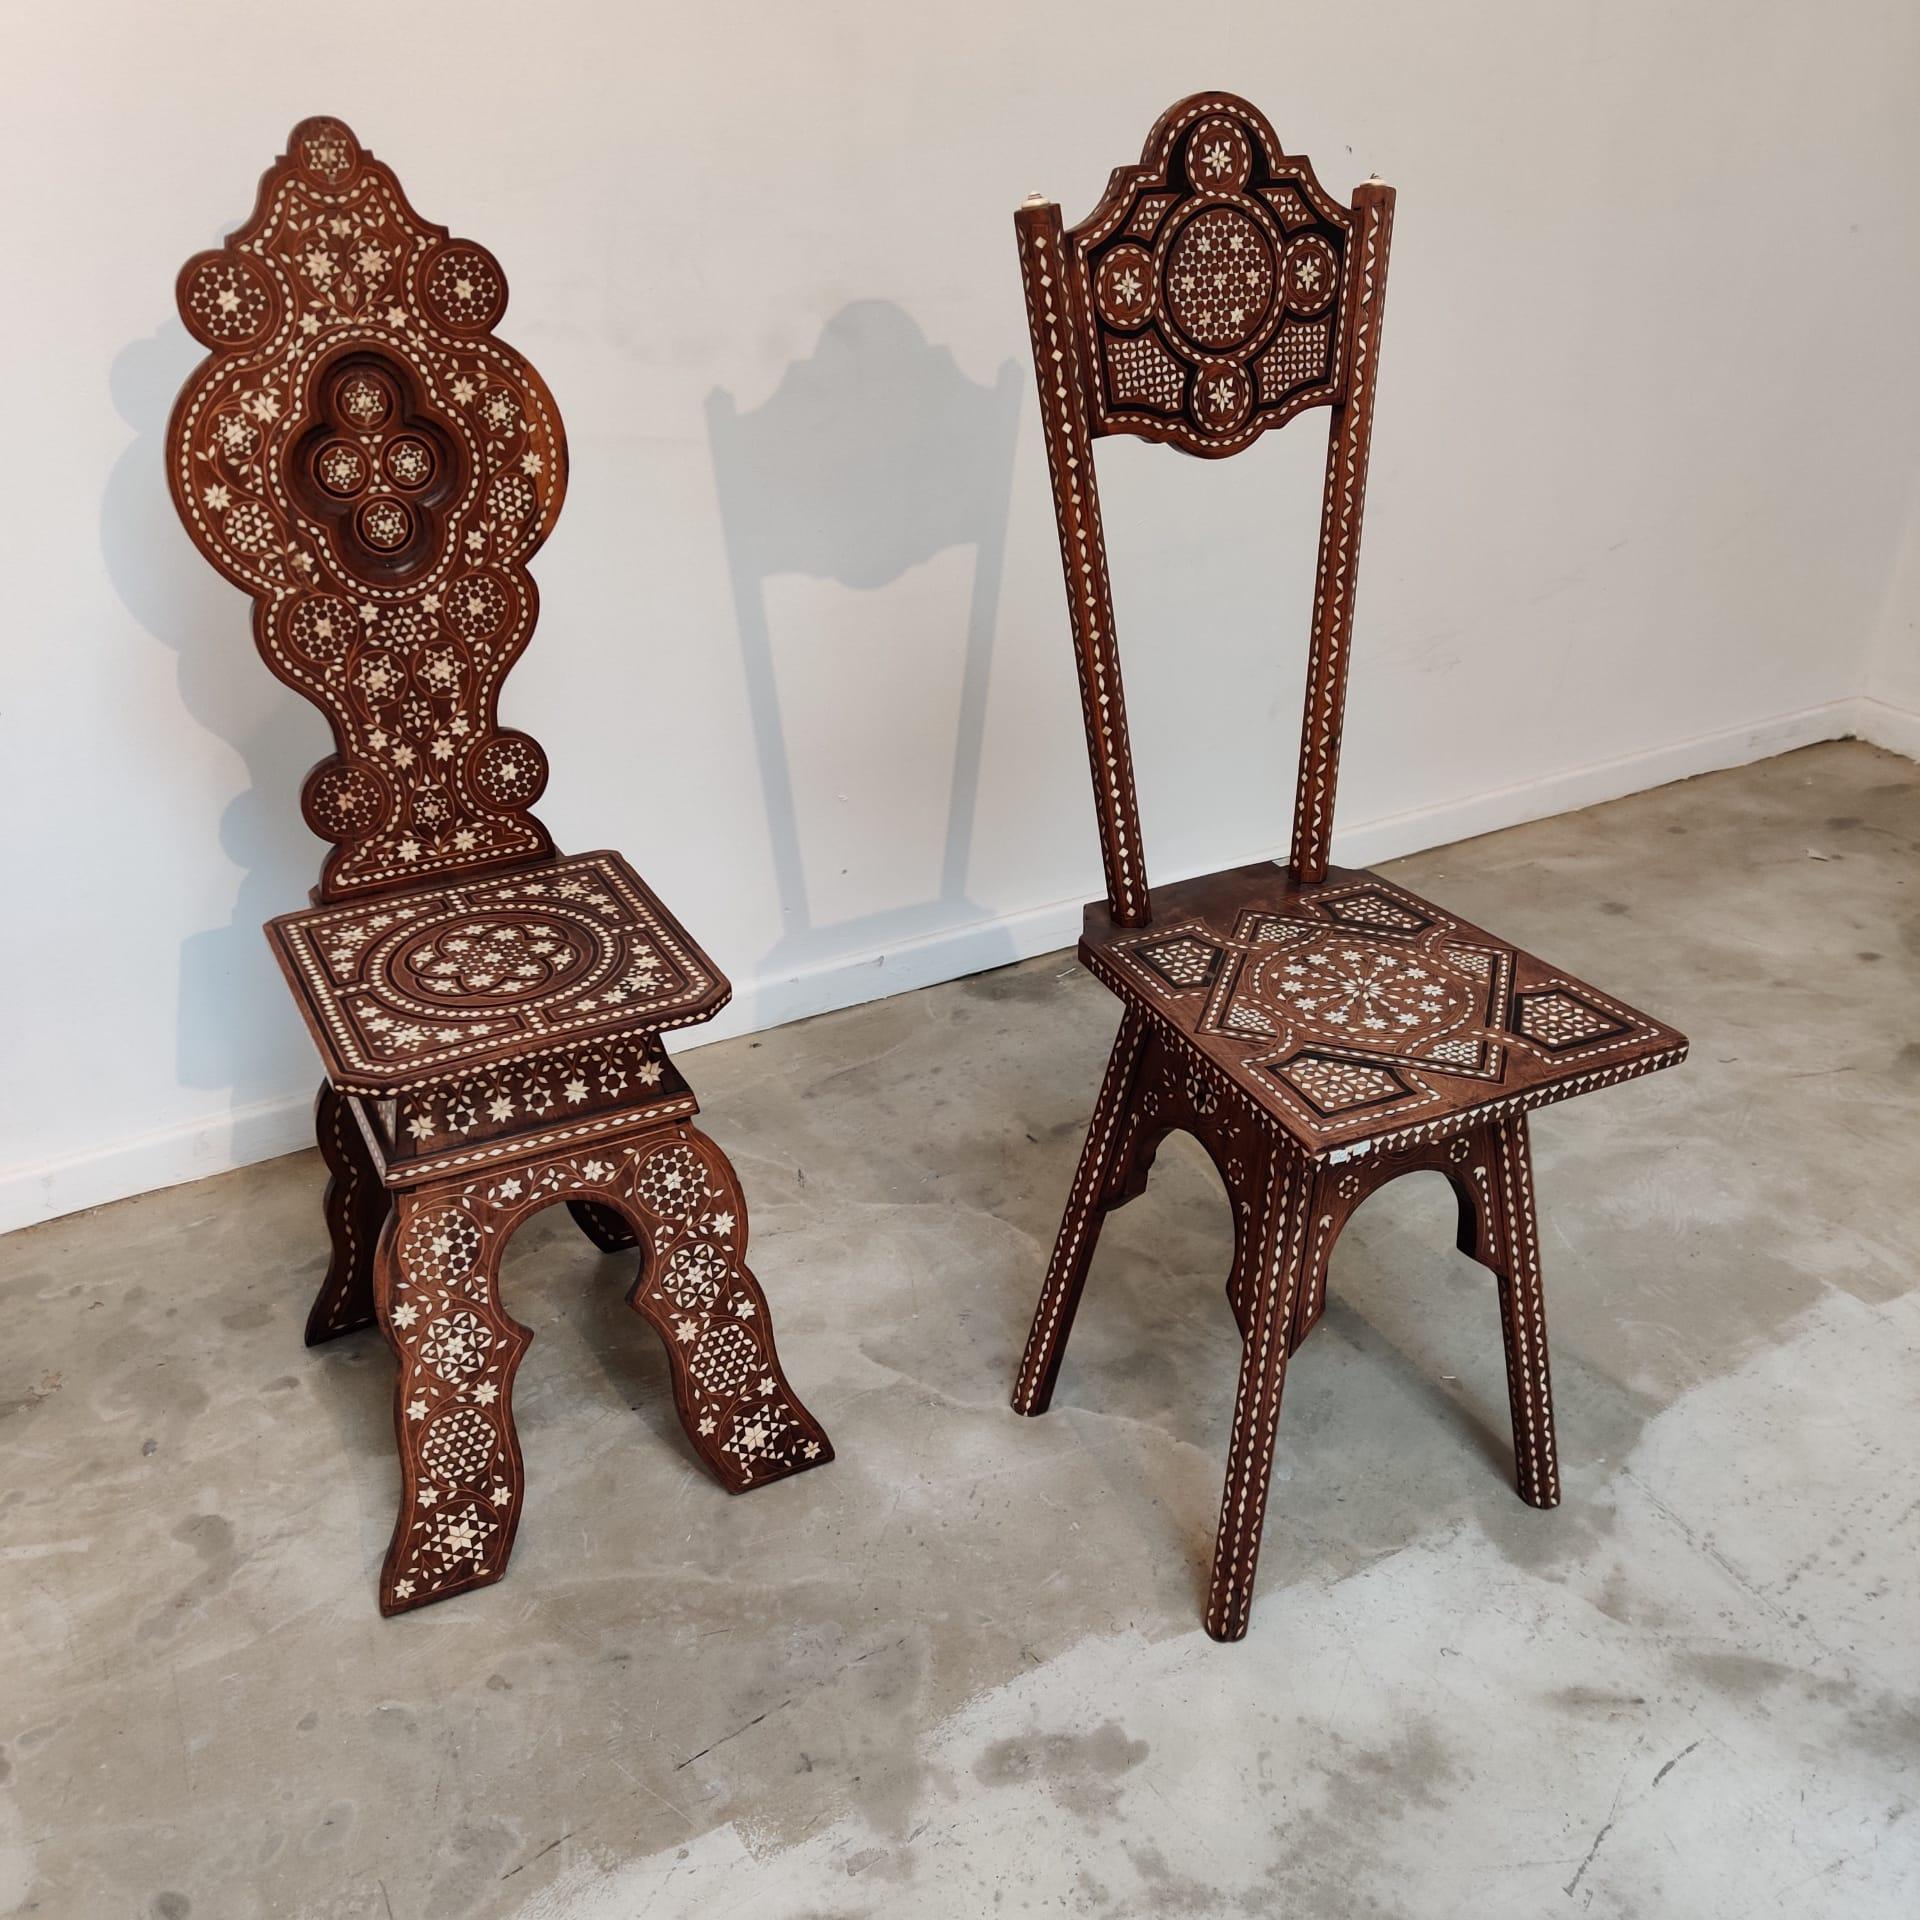 Syrian XIXth century chairs